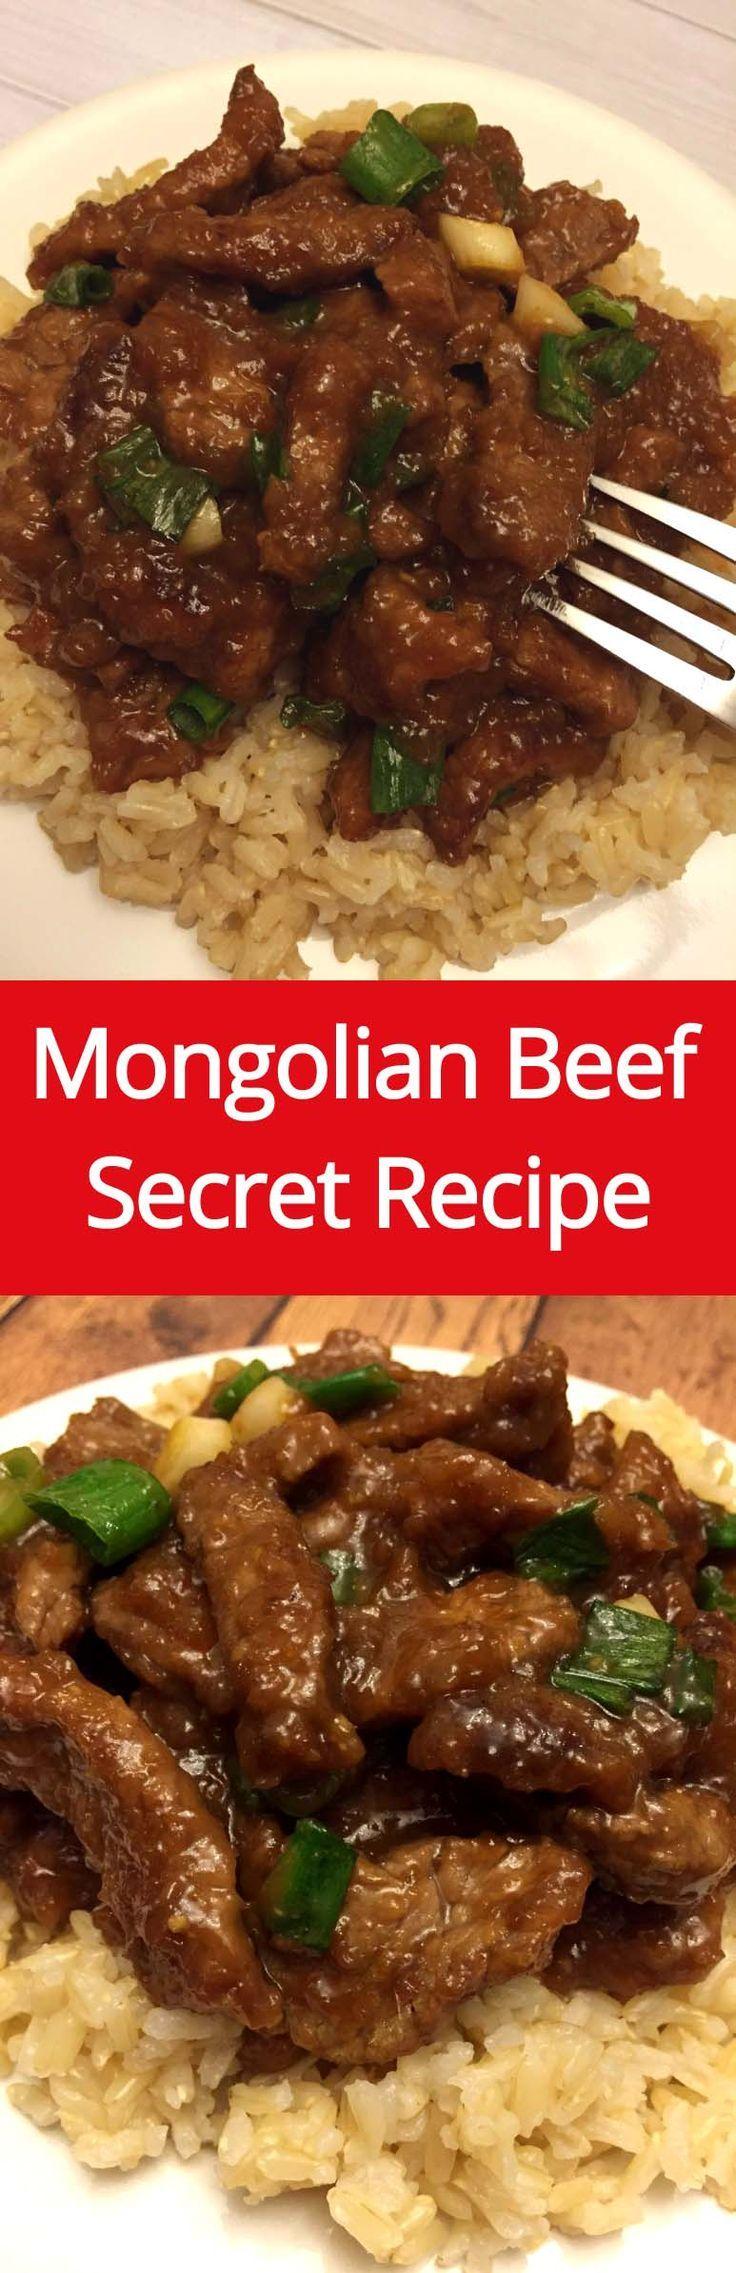 Authentic Mongolian Beef Copycat Recipe Like PF Chang's